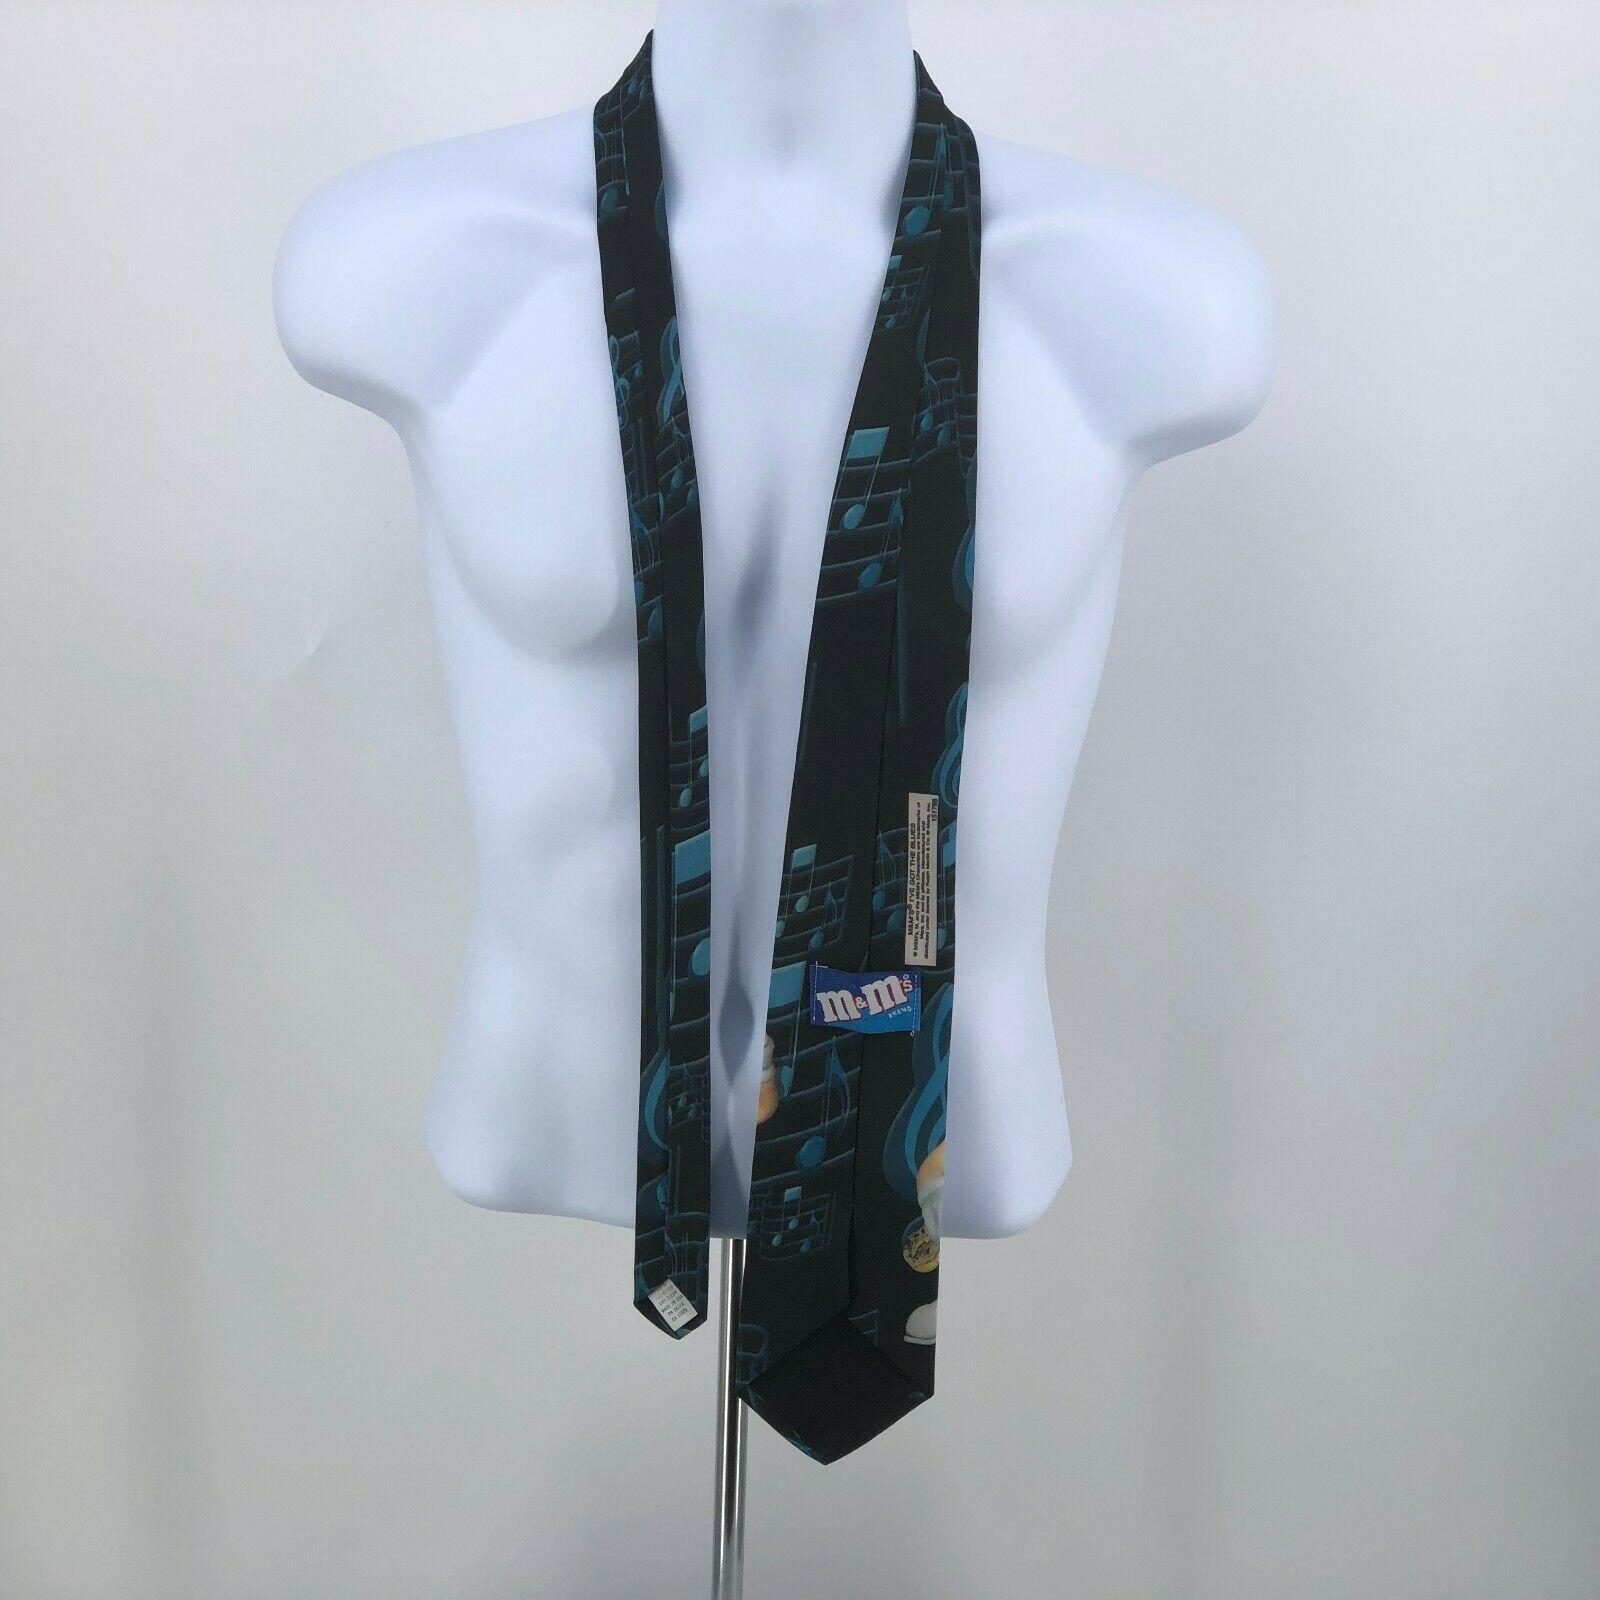 Vintage Whimsical M&Ms Candy I've Got The Blues Novelty Neck Tie USA Made  image 3